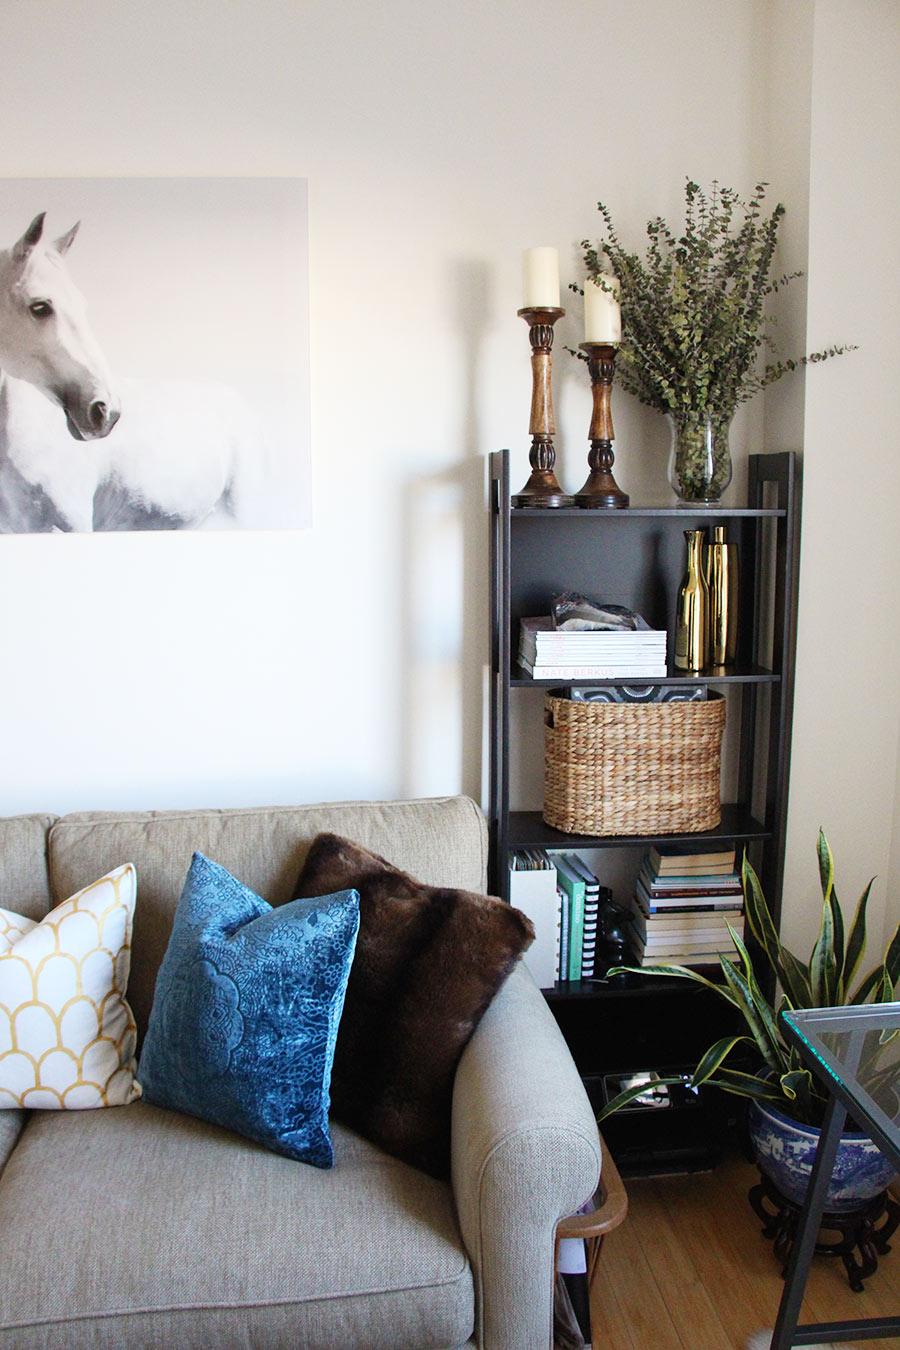 horse-wall-art-homegoods-style-homegoods-happy.jpg